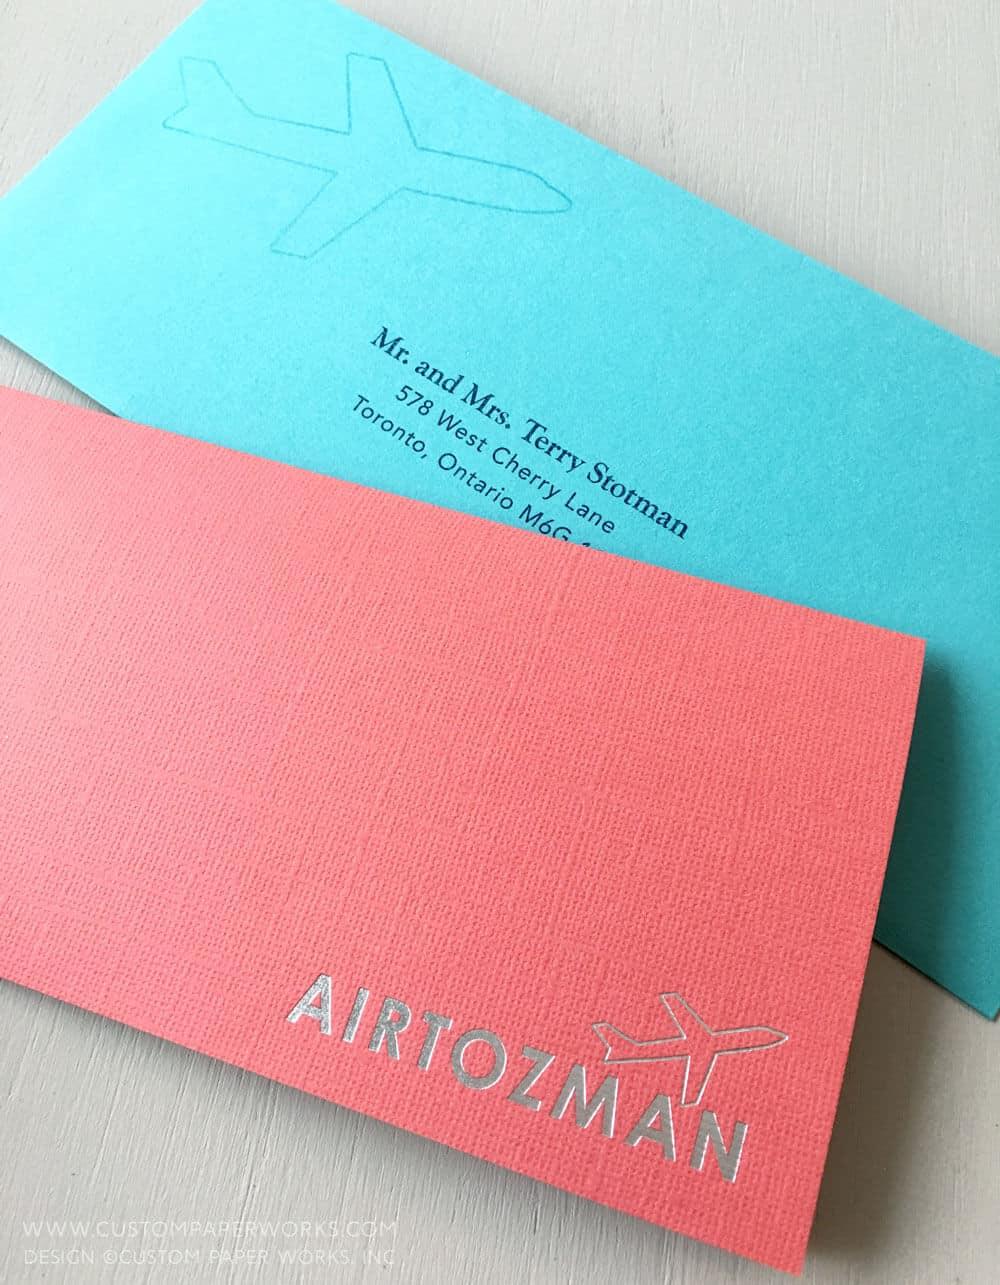 Colorful custom-designed Bat mitzvah boarding pass invitation